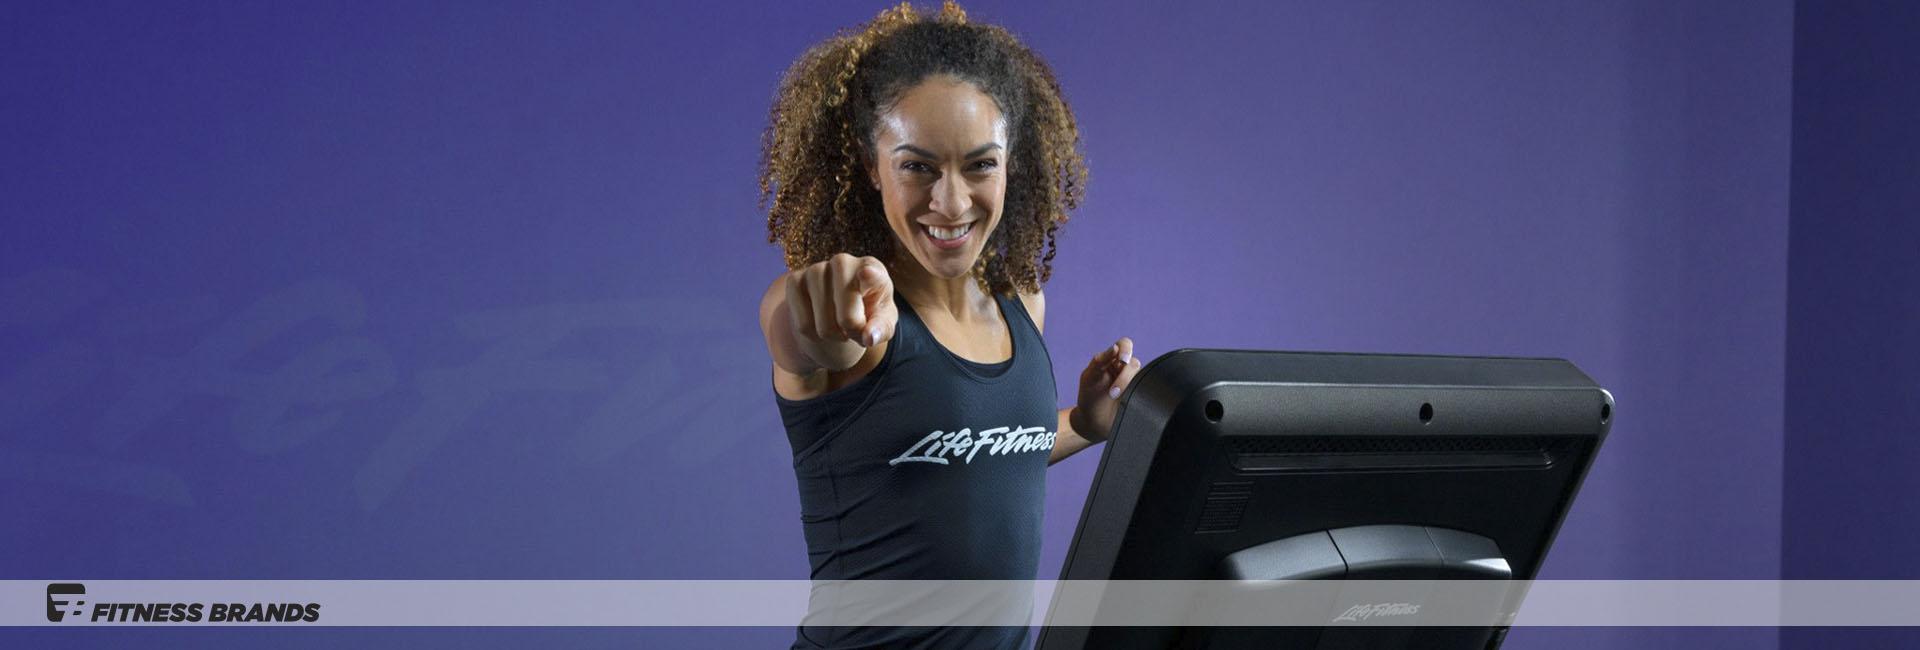 Fitness Brands